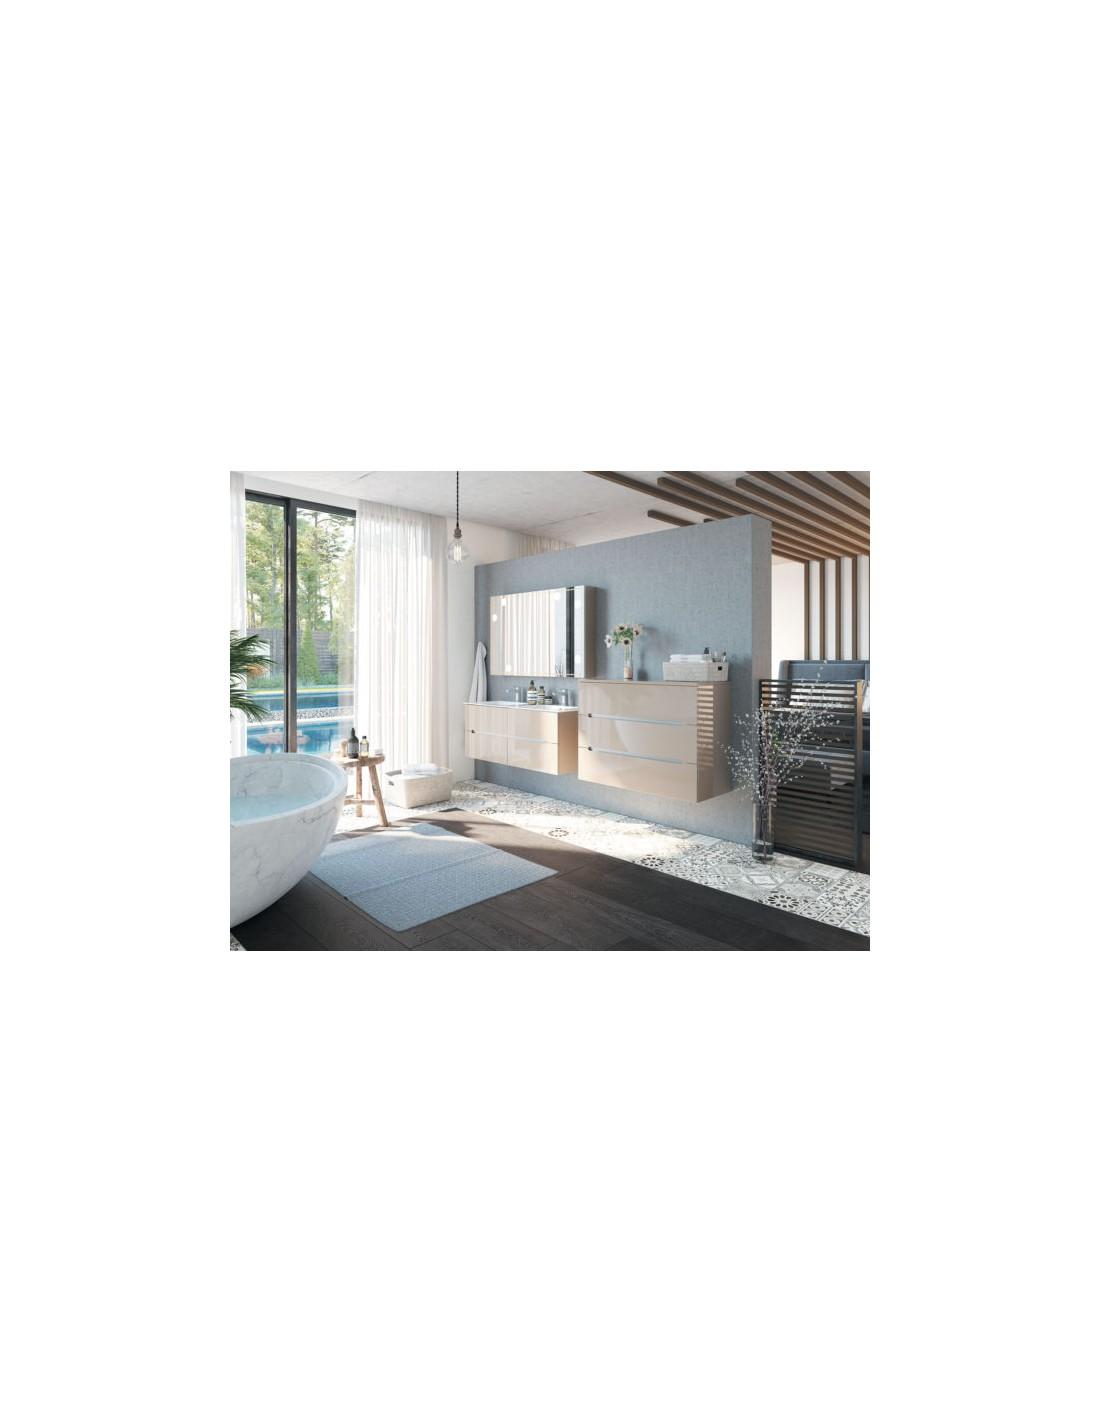 meuble sous plan vasque bento 3 tiroirs sans poign e decotec. Black Bedroom Furniture Sets. Home Design Ideas